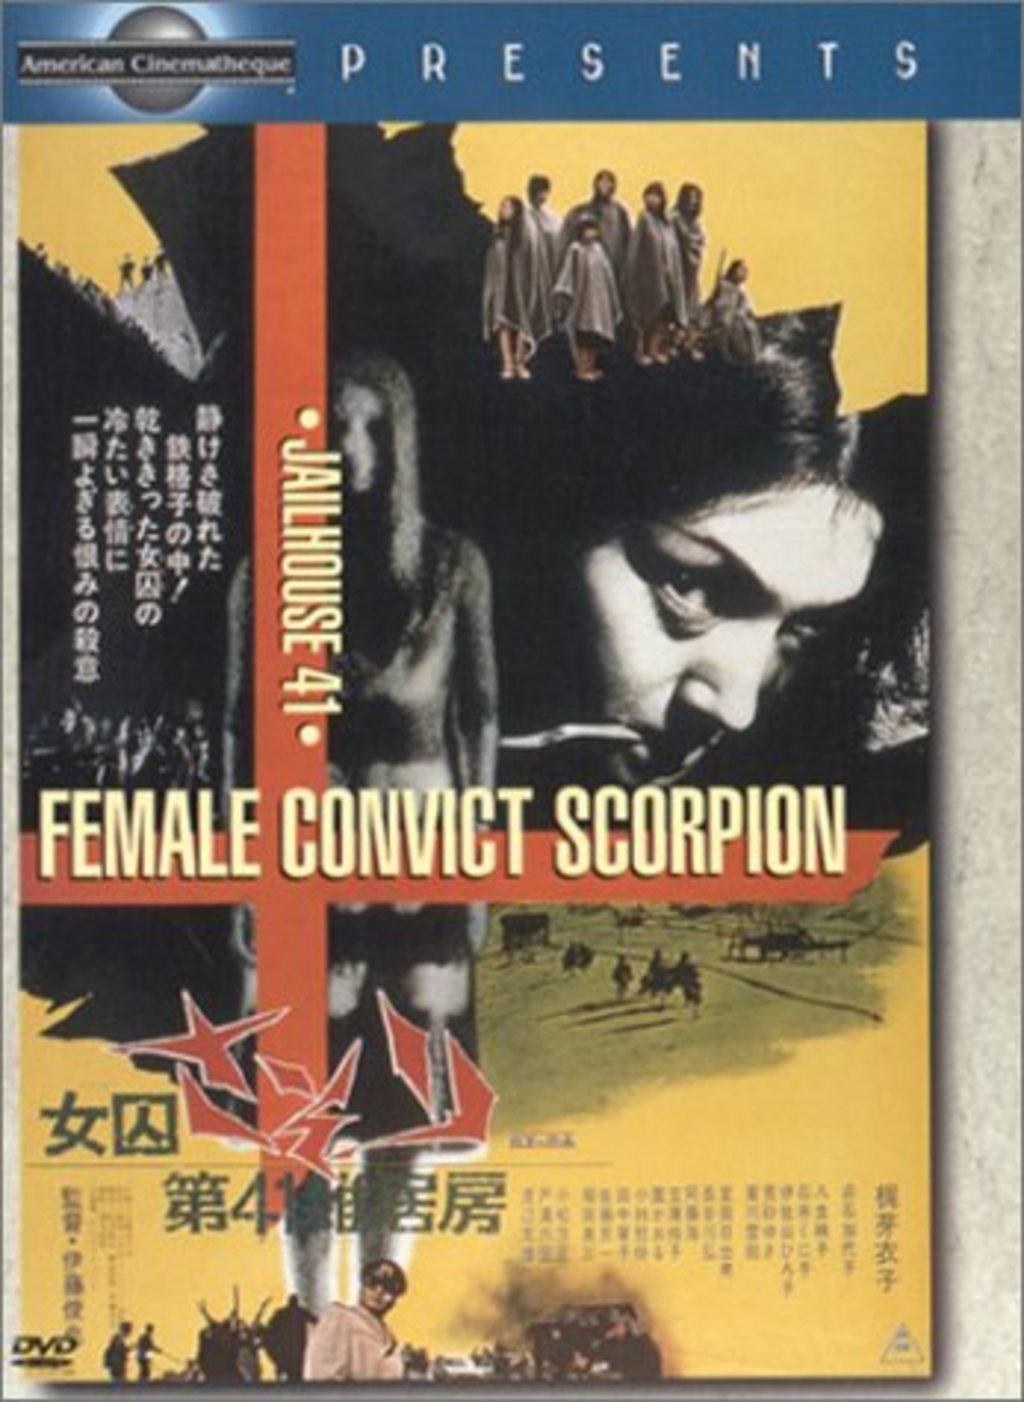 watch female prisoner scorpion jailhouse 41 on netflix